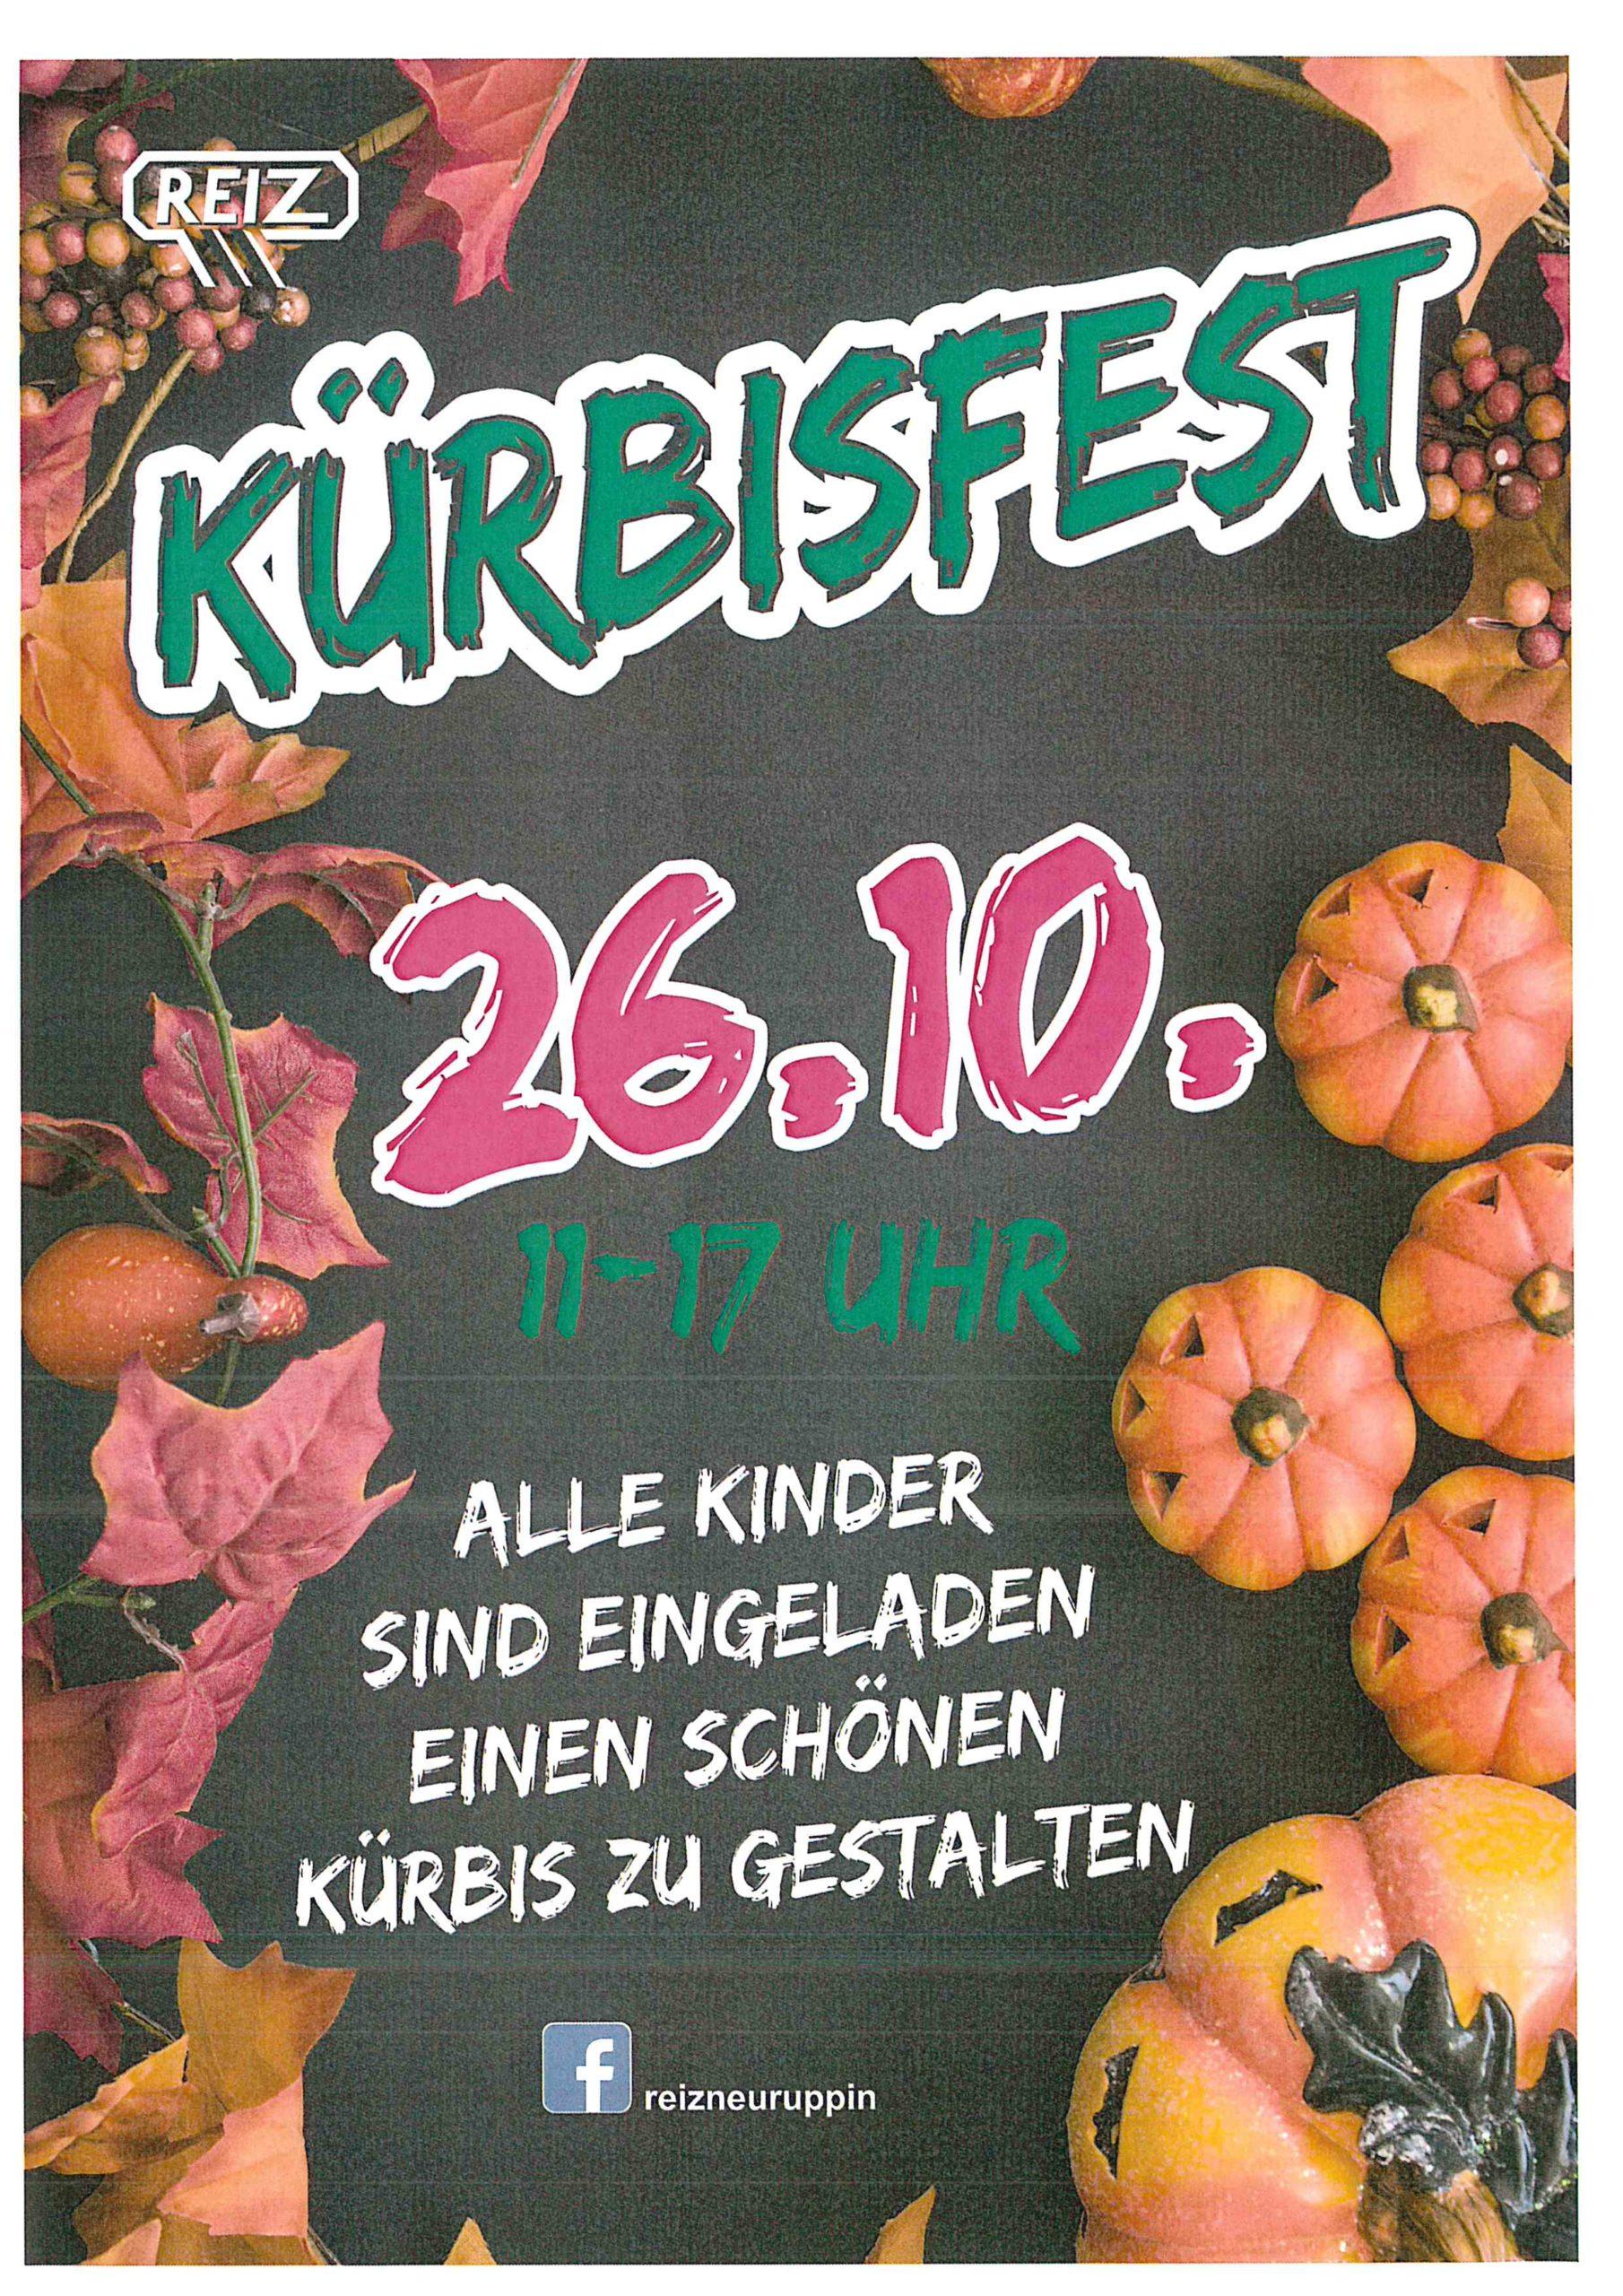 Kürbisfest am 26.10.2019